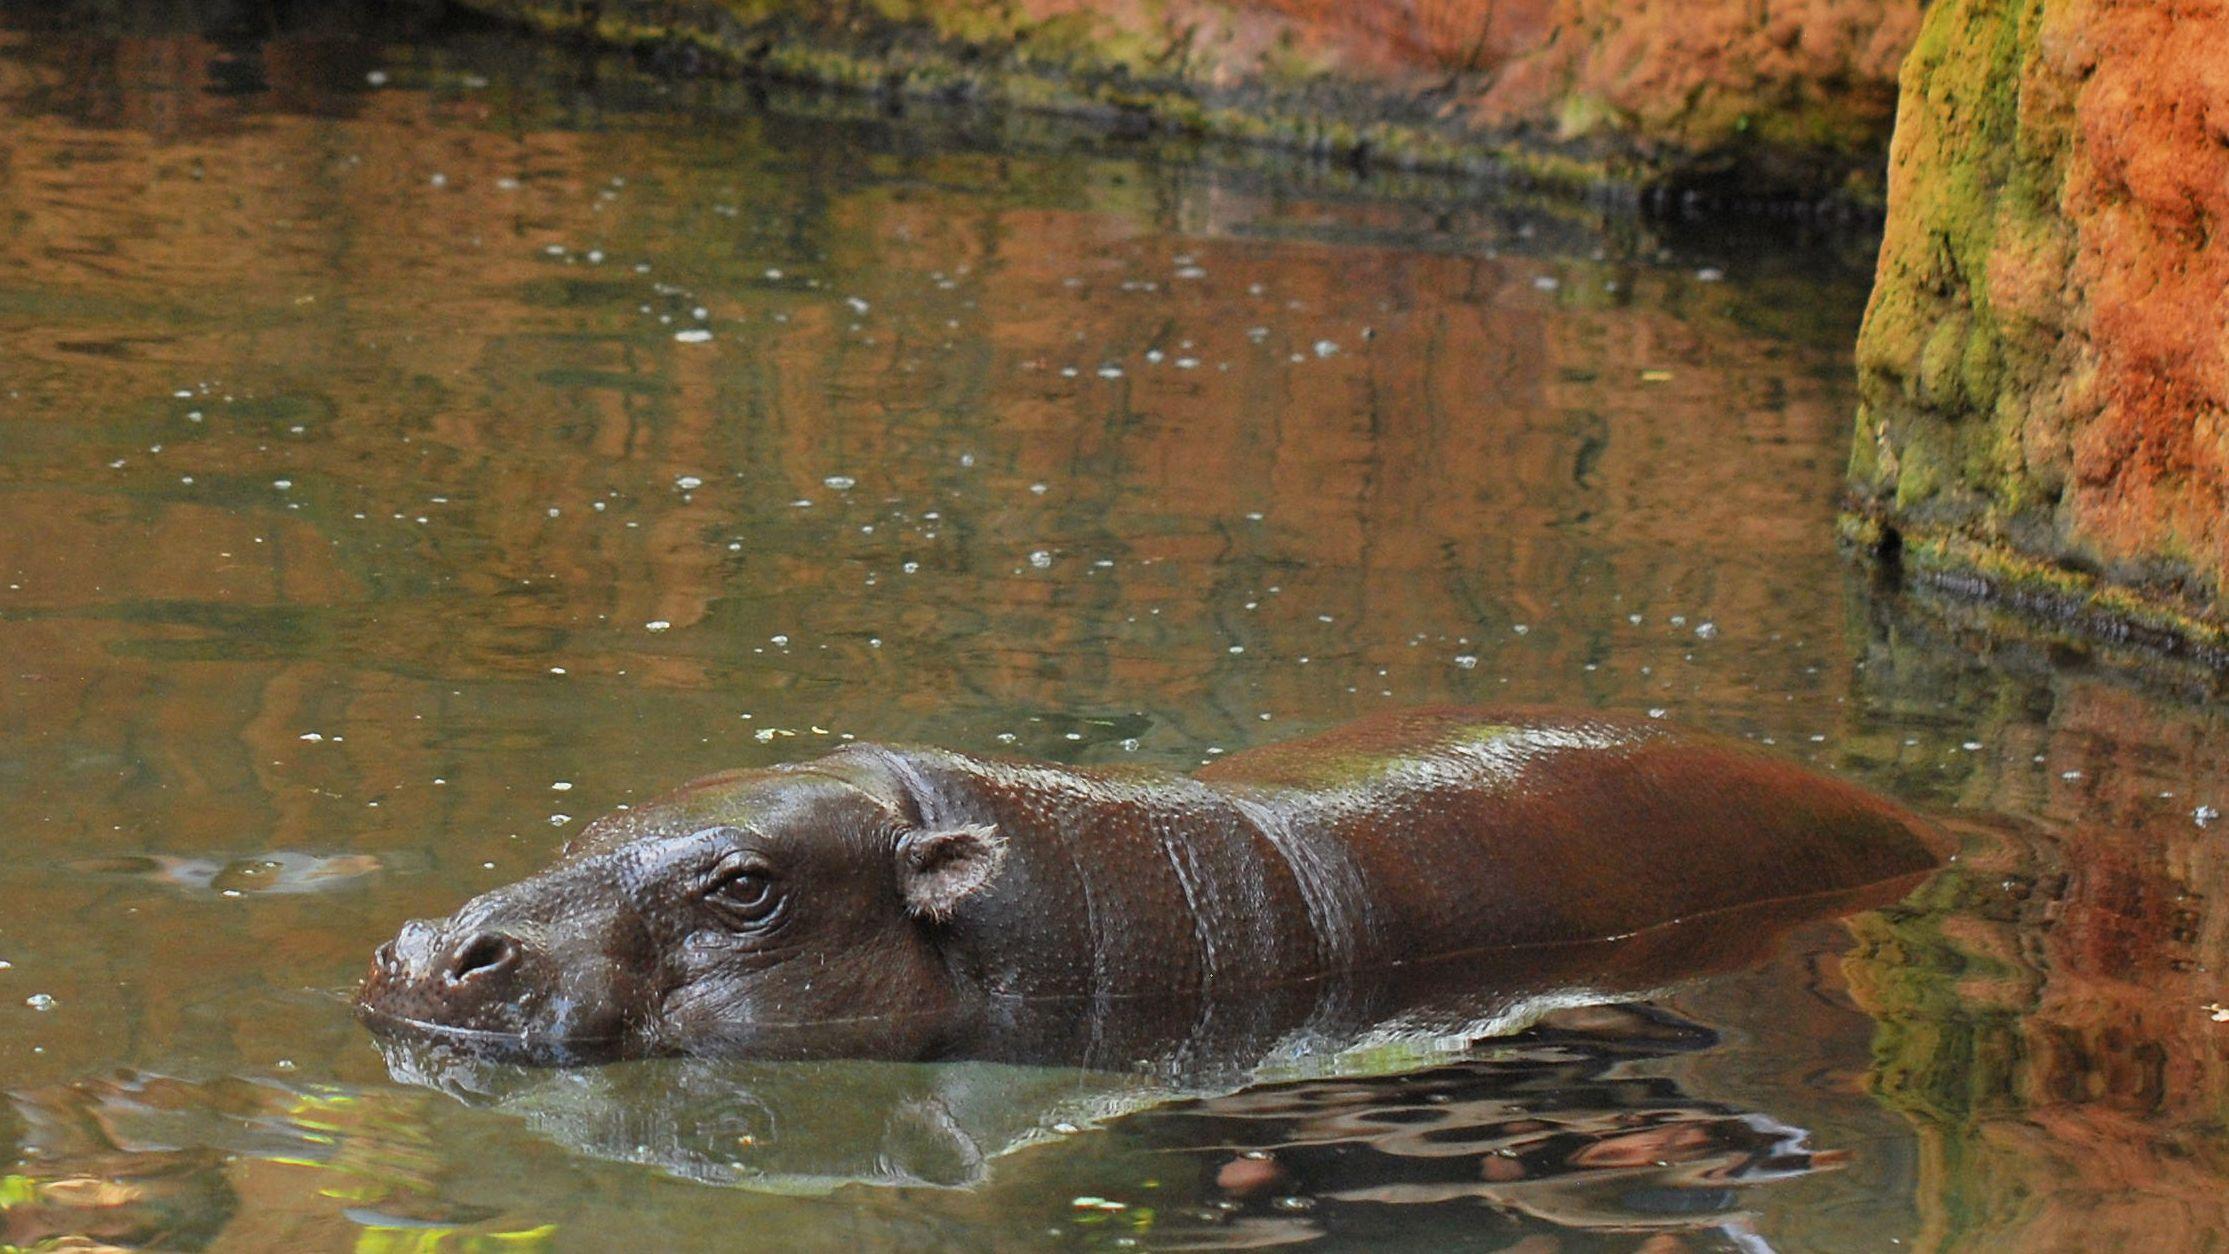 Hippopotamus wading in water of enclosure at Bioparc Fuengirola in Malaga